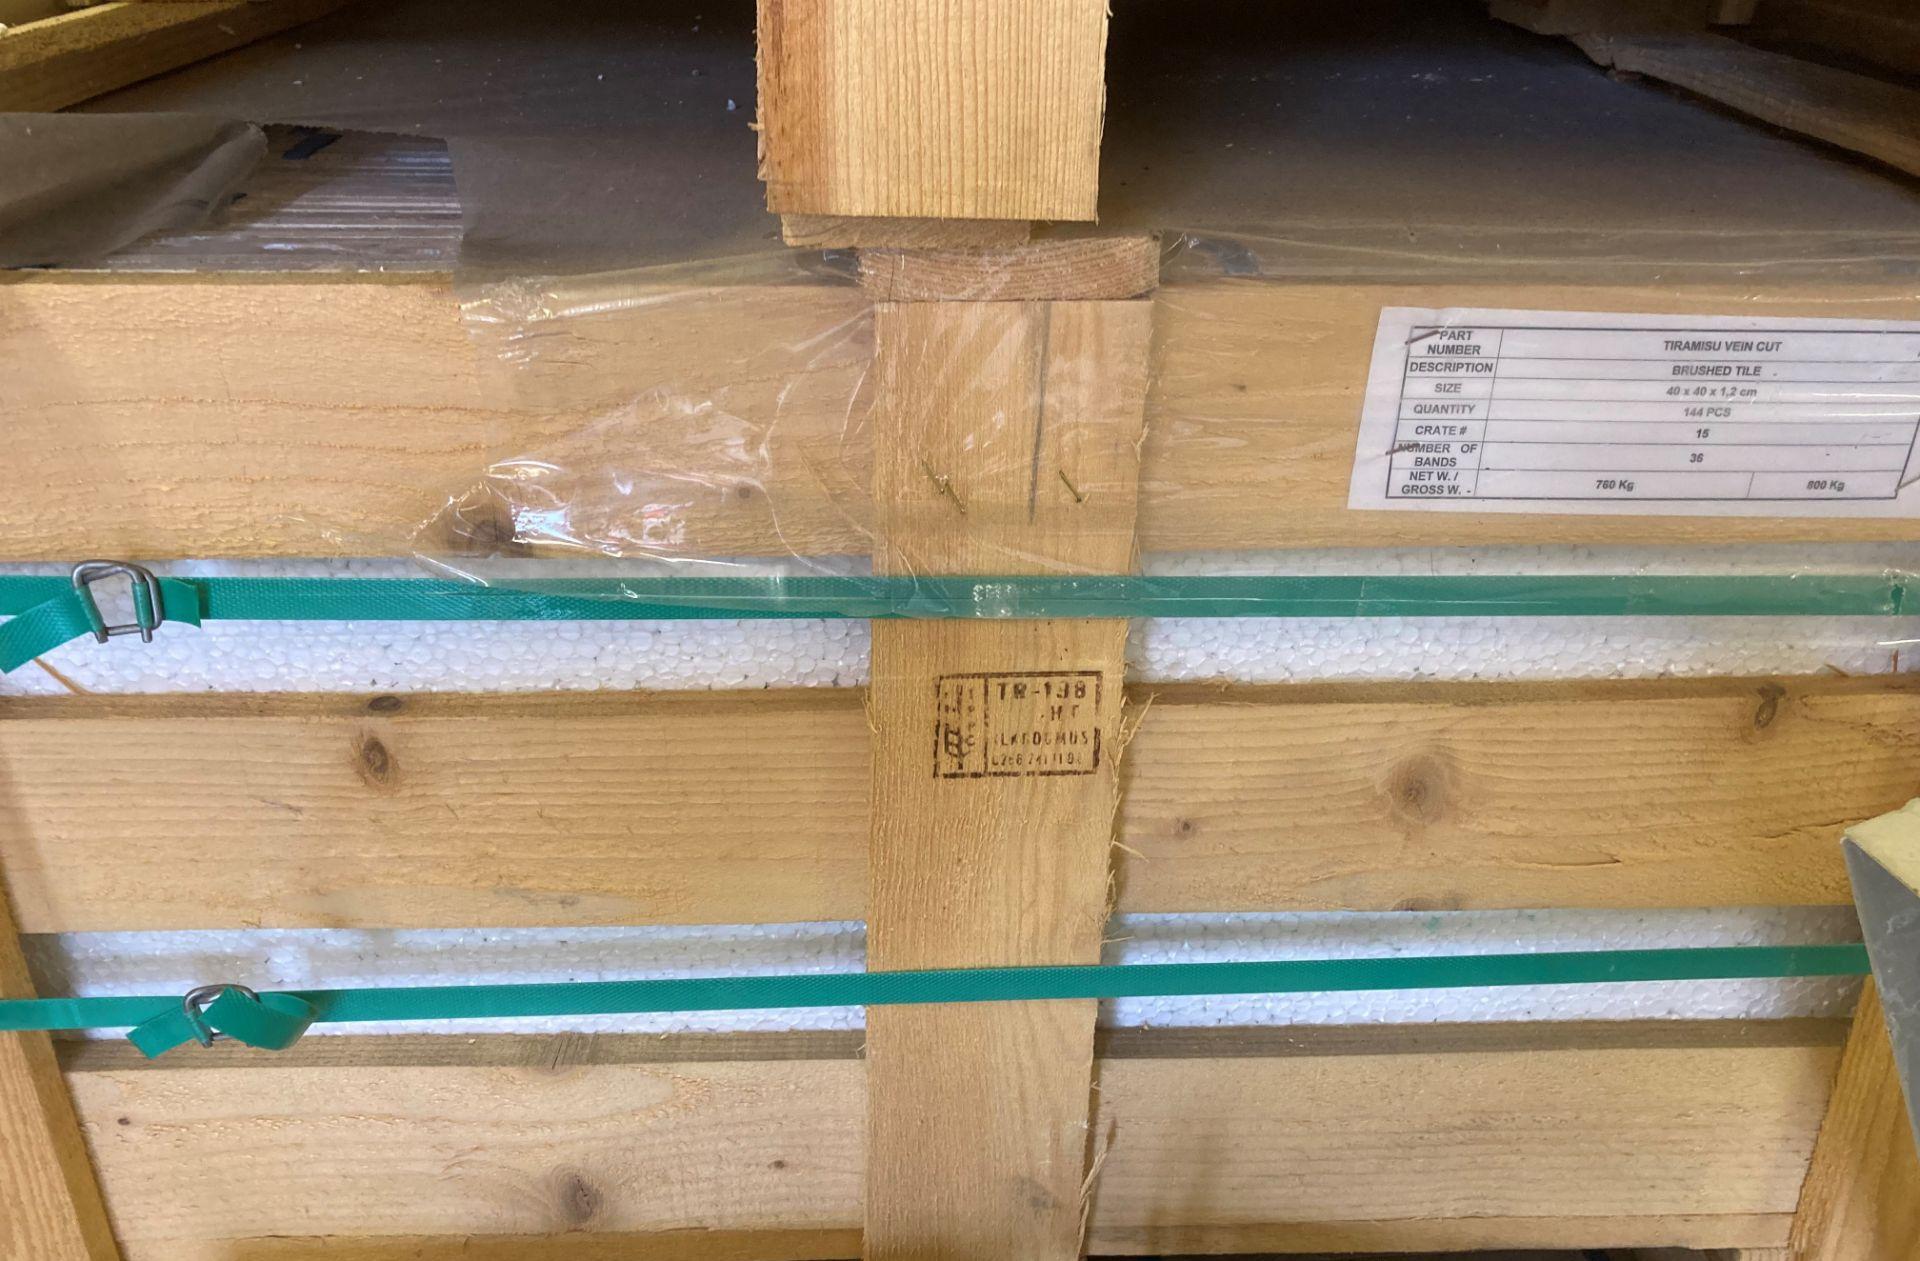 36 x packs of 4 marble tiramisu vein cut brushed tiles - 40 x 40 x 1. - Image 2 of 2